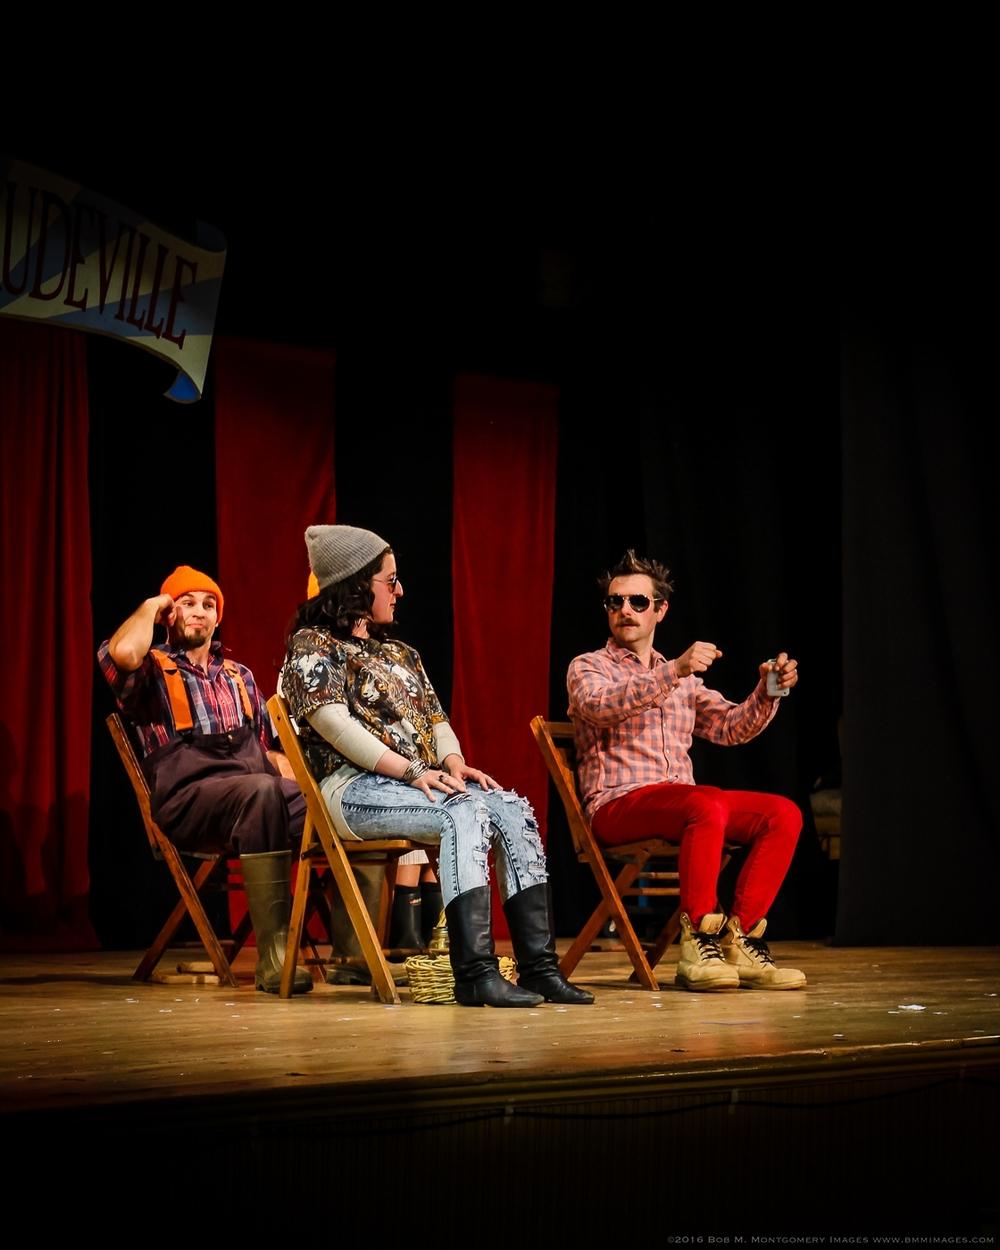 Vermont Vaudeville 20160513 - 0105.jpg